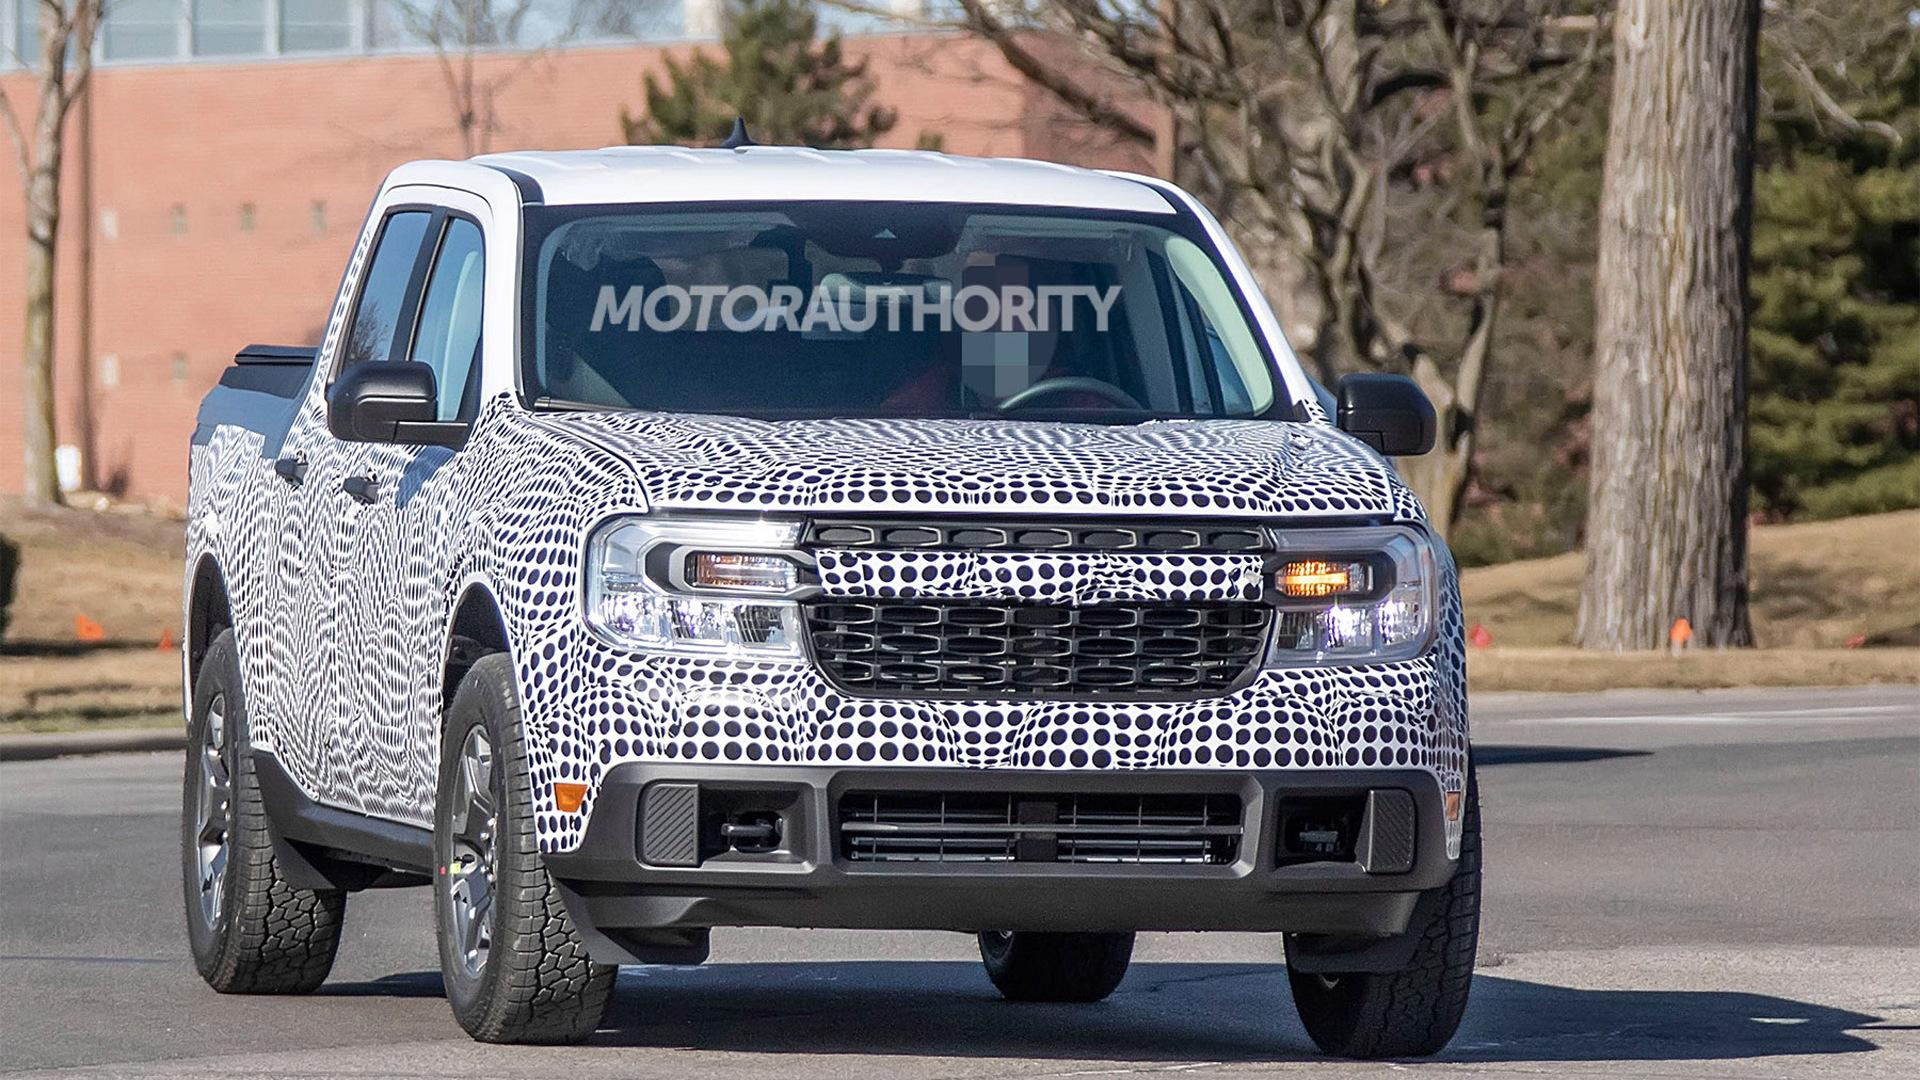 2022 Ford Maverick spy shots - Photo credit:S. Baldauf/SB-Medien